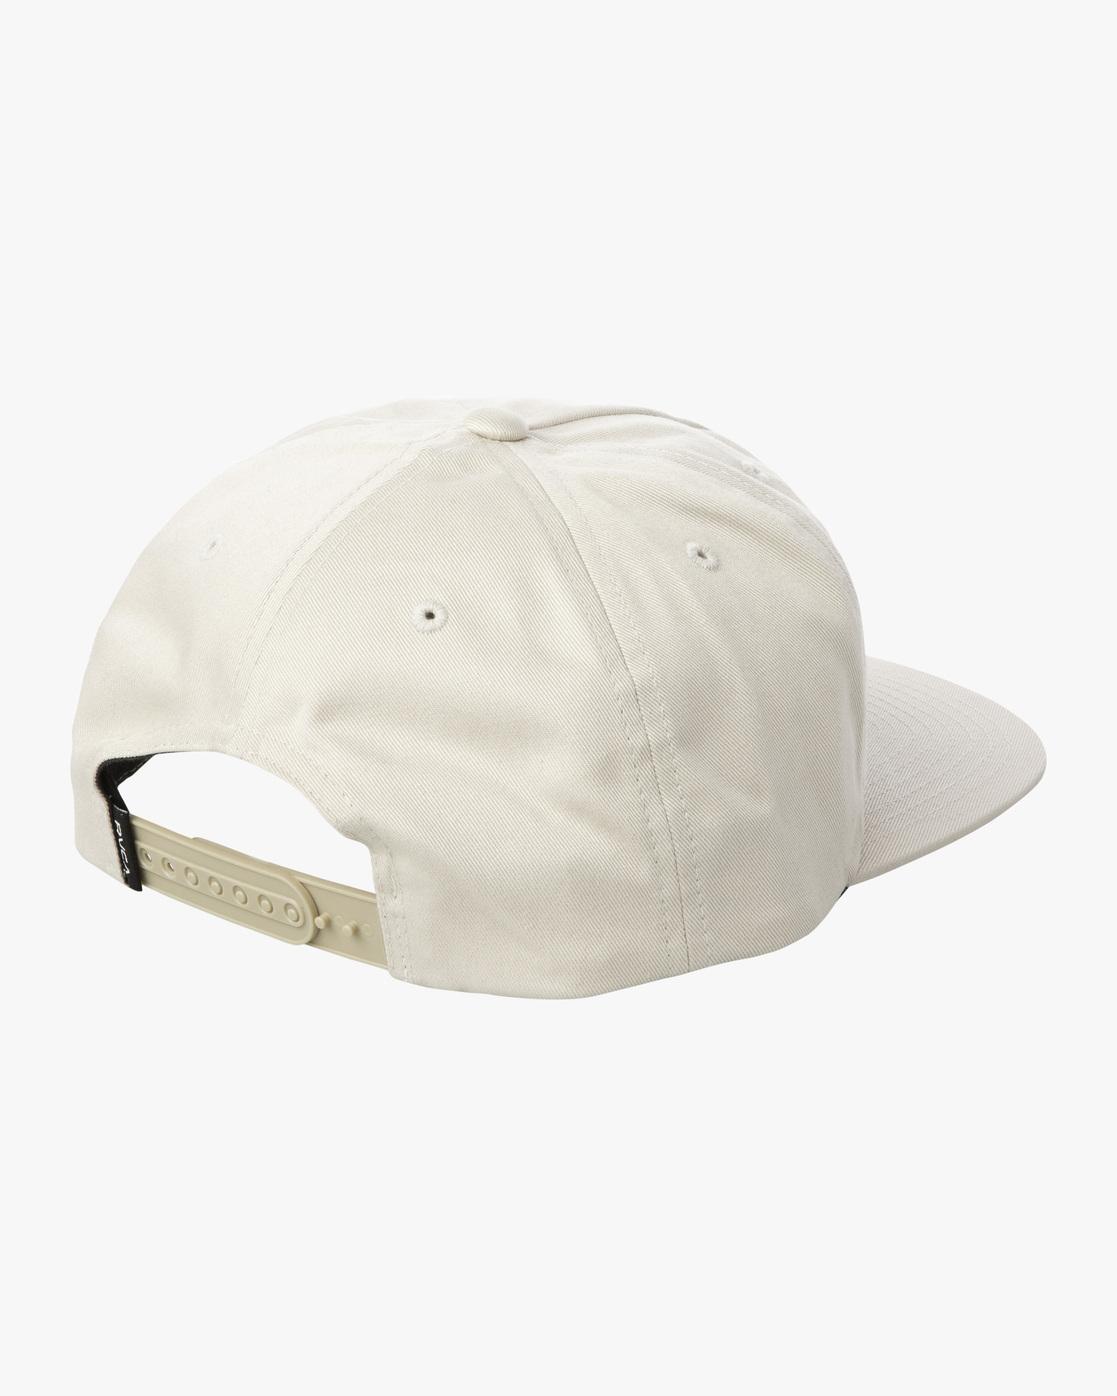 R\u00eaveur Embroidered Hat